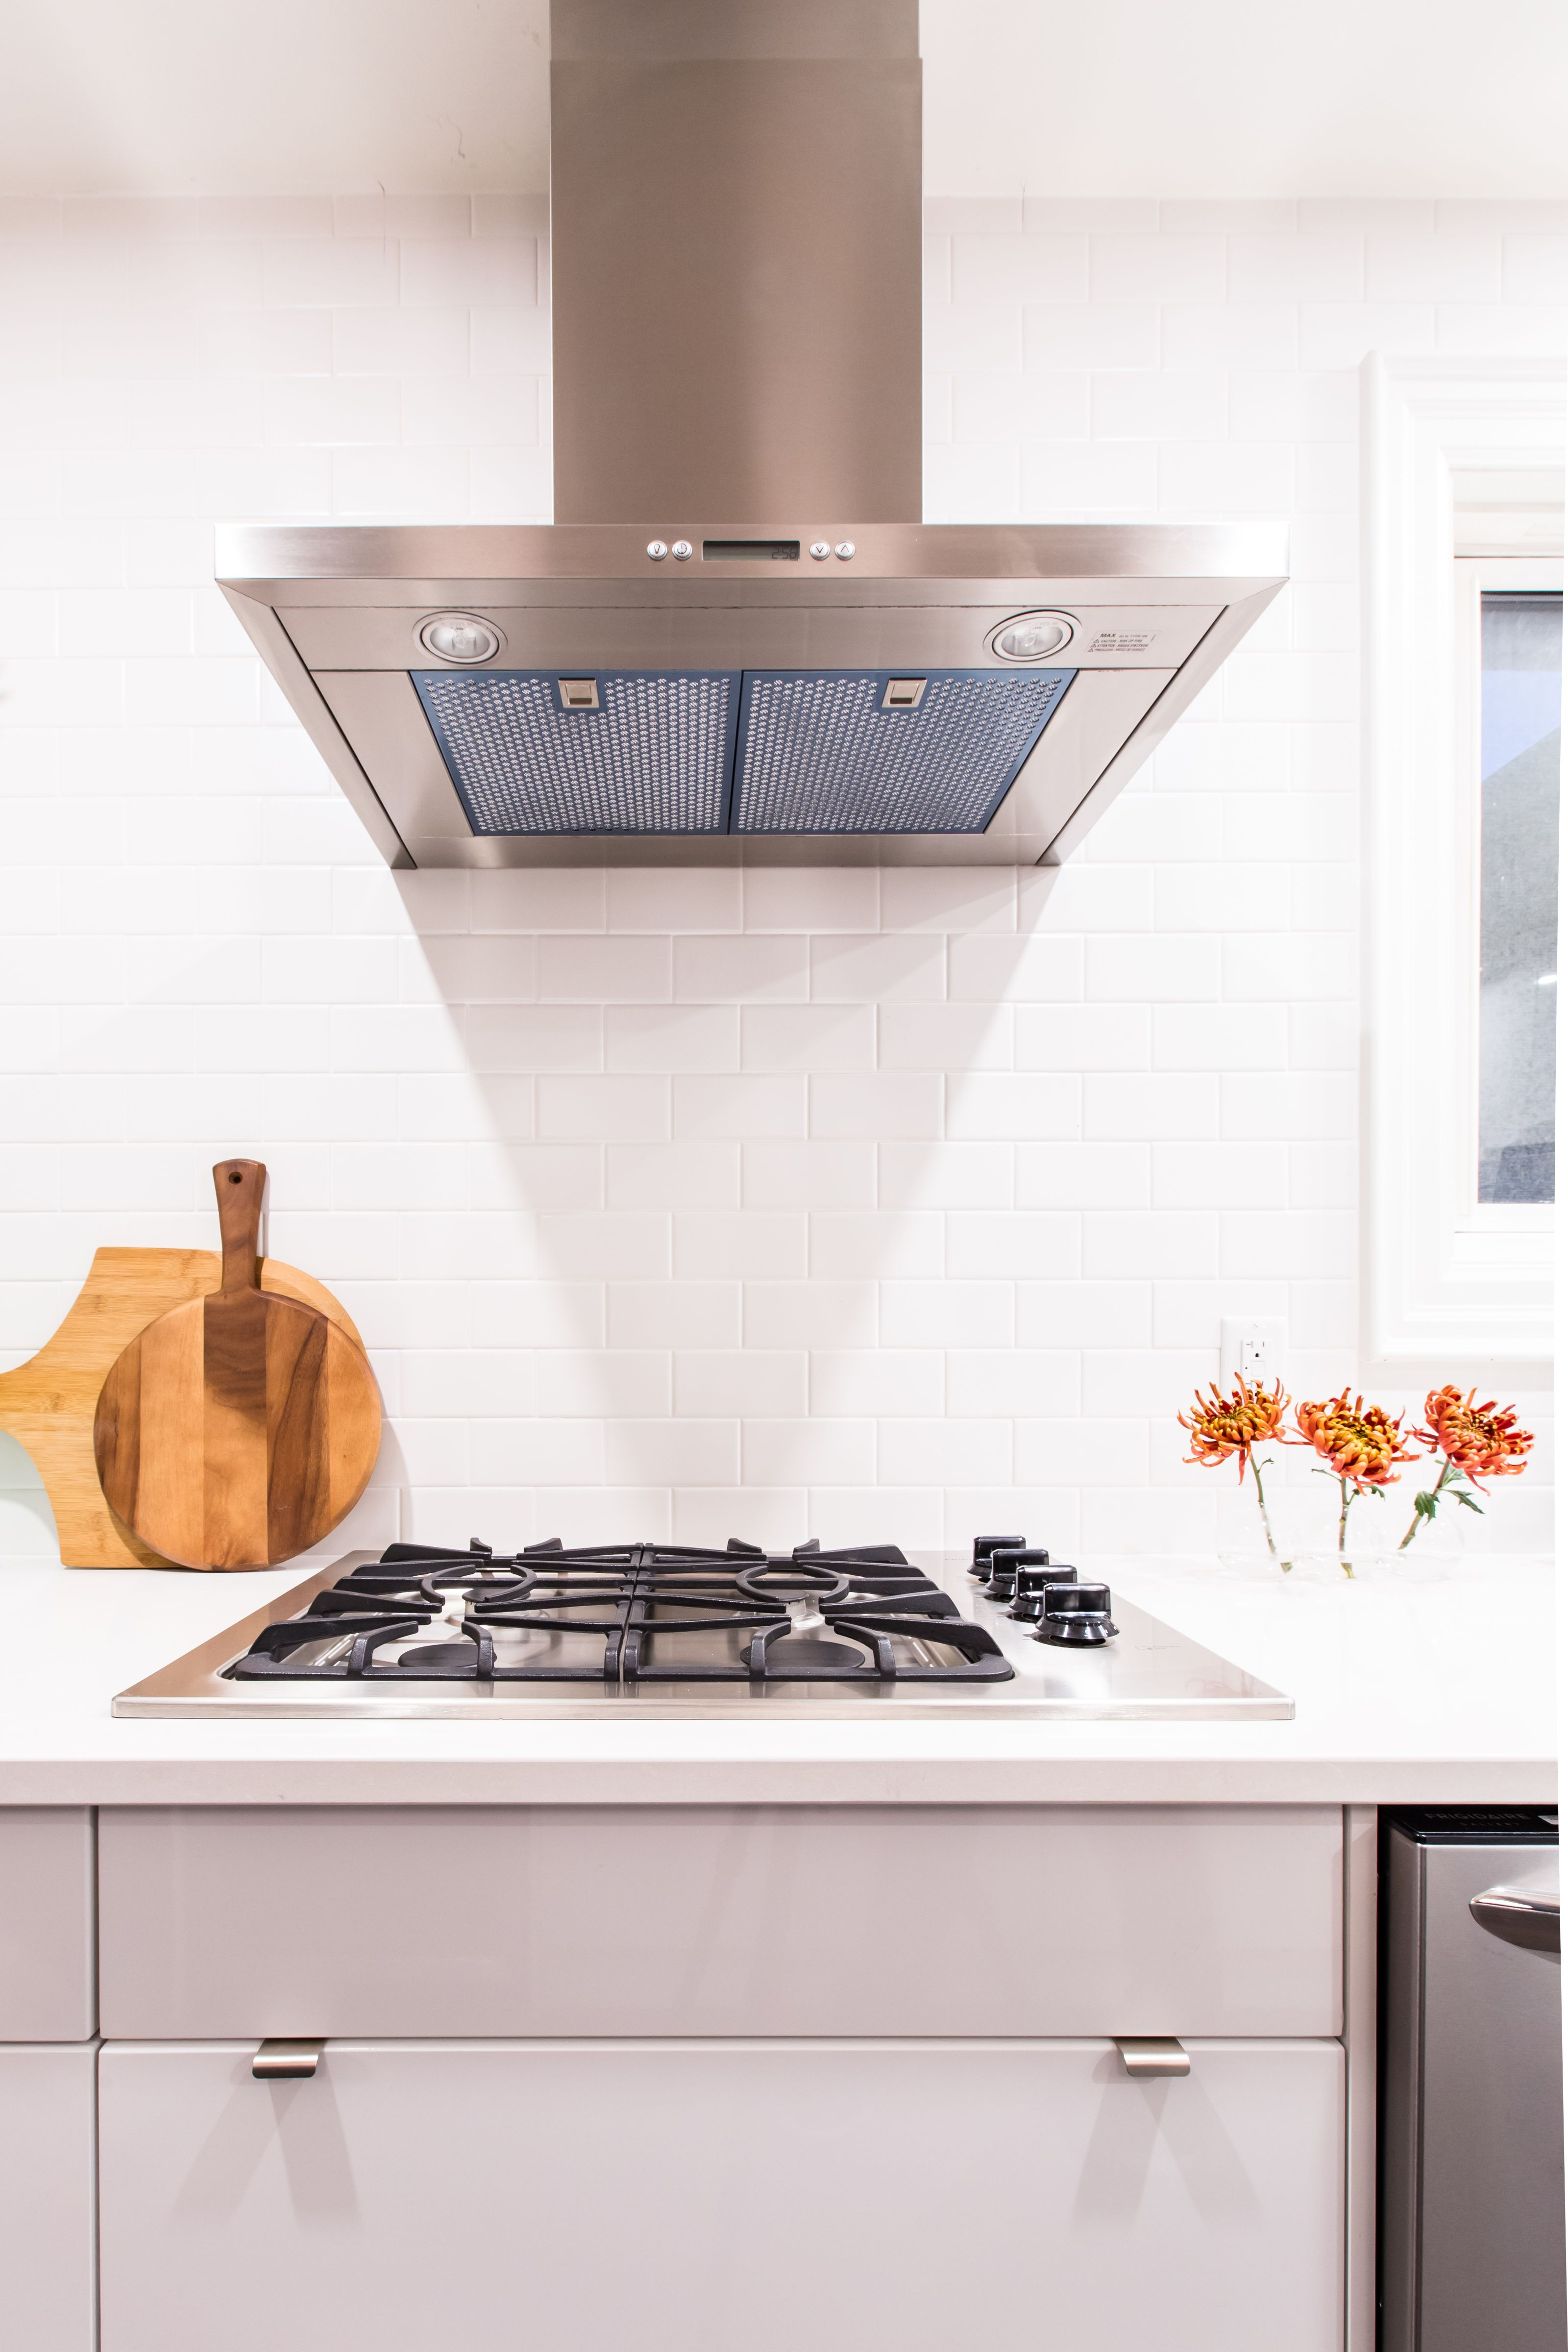 Frigidaire Professional Series Range Hood In Stainless Steel Rh30wc55gs Disenos De Unas Hermanos A La Obra Cocinas